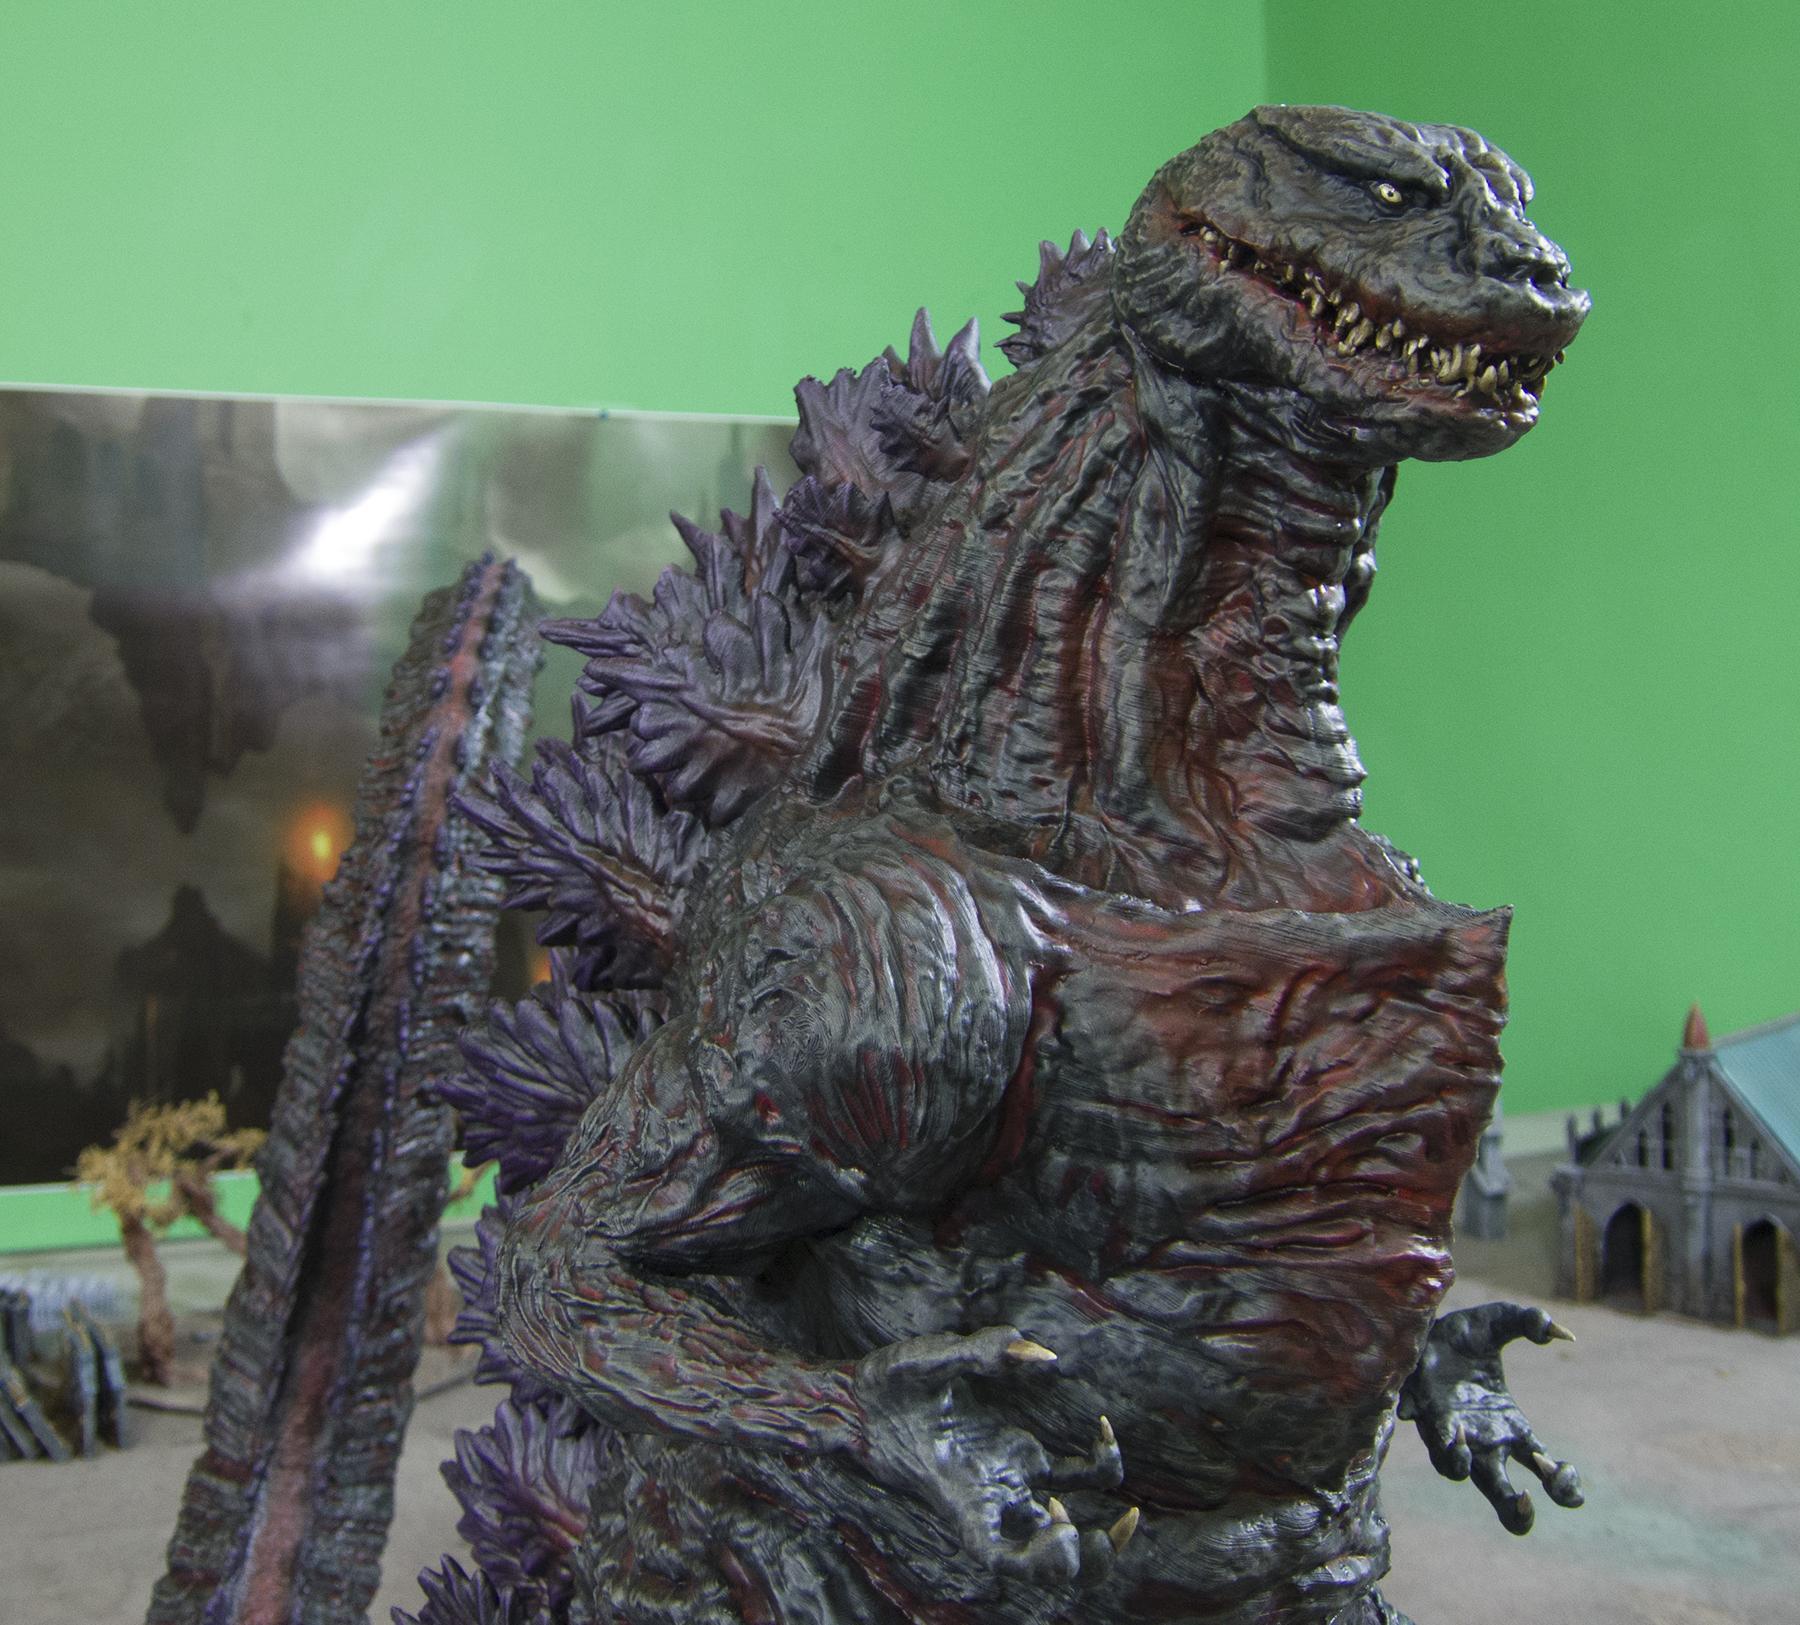 3d Printing, Anycubic I3 Mega, Anycubic Photon, Dlp, Fdm, Gambody, Godzilla, Large, Shin Godzilla